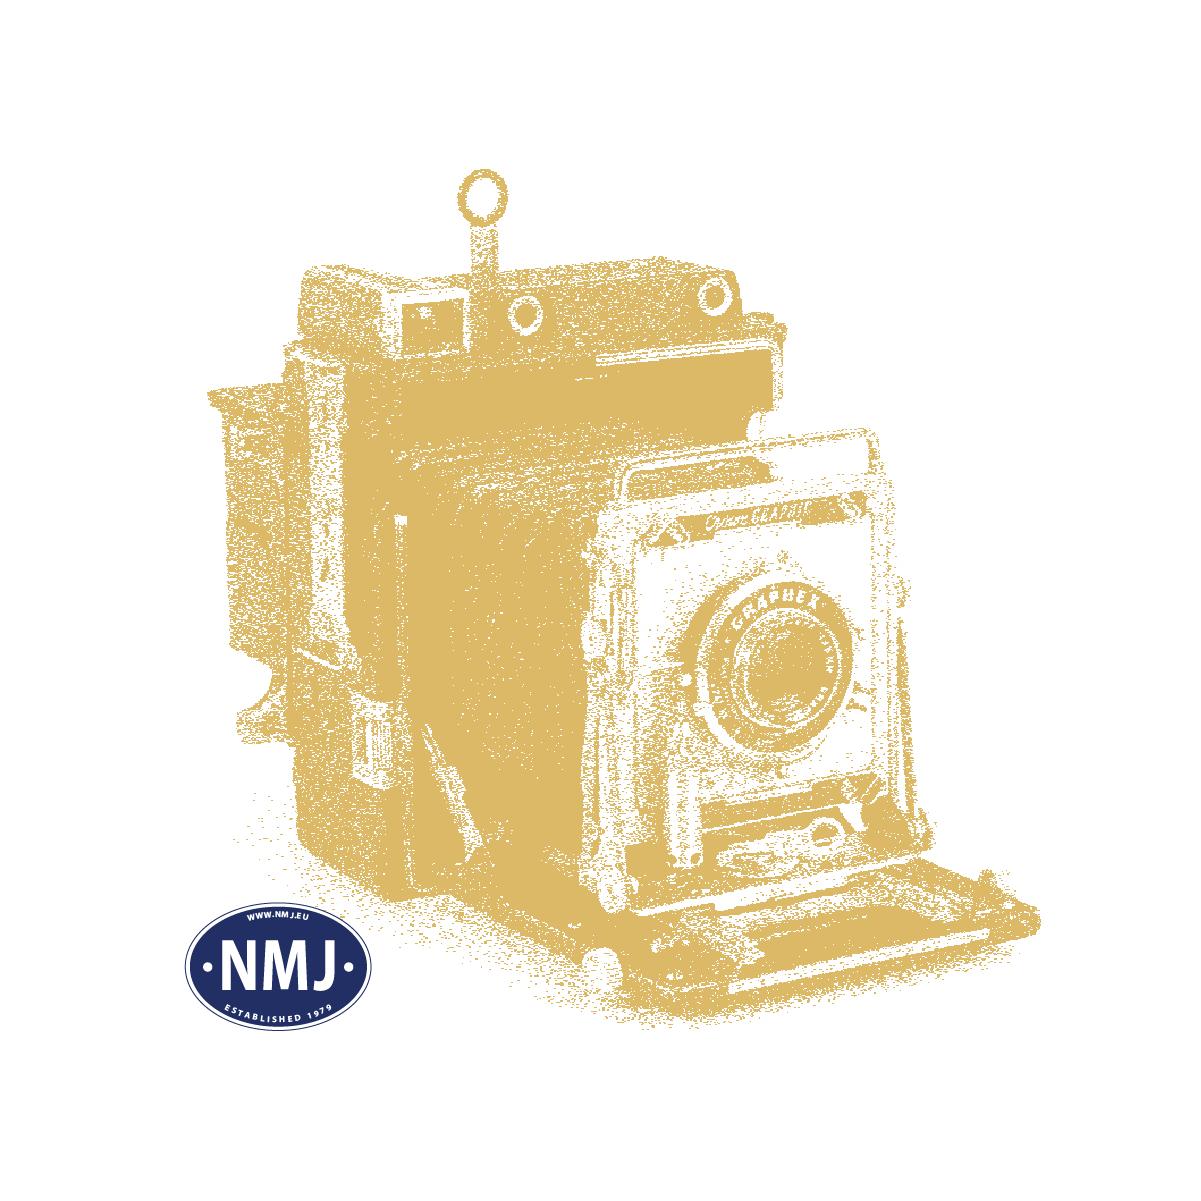 NMJT90304 - NMJ Topline CFL Diesellok 1601 (1956-1971), DC